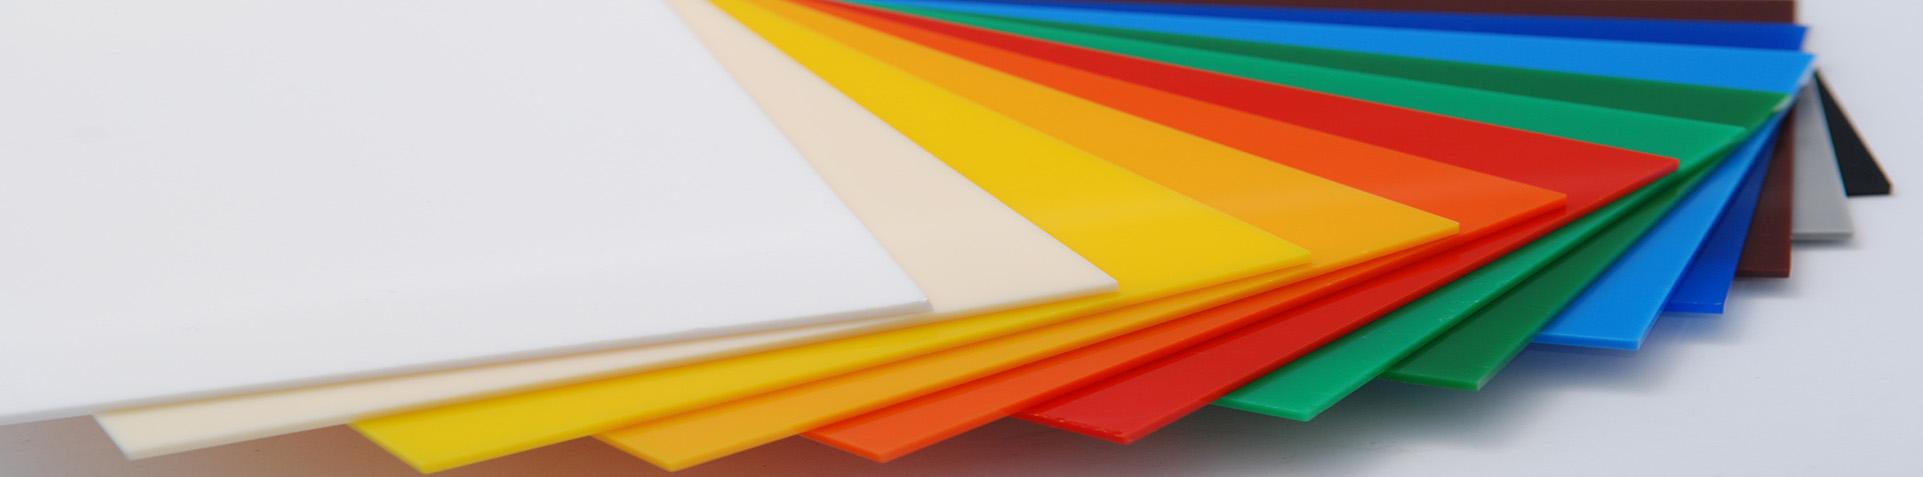 Banner tấm nhựa mica